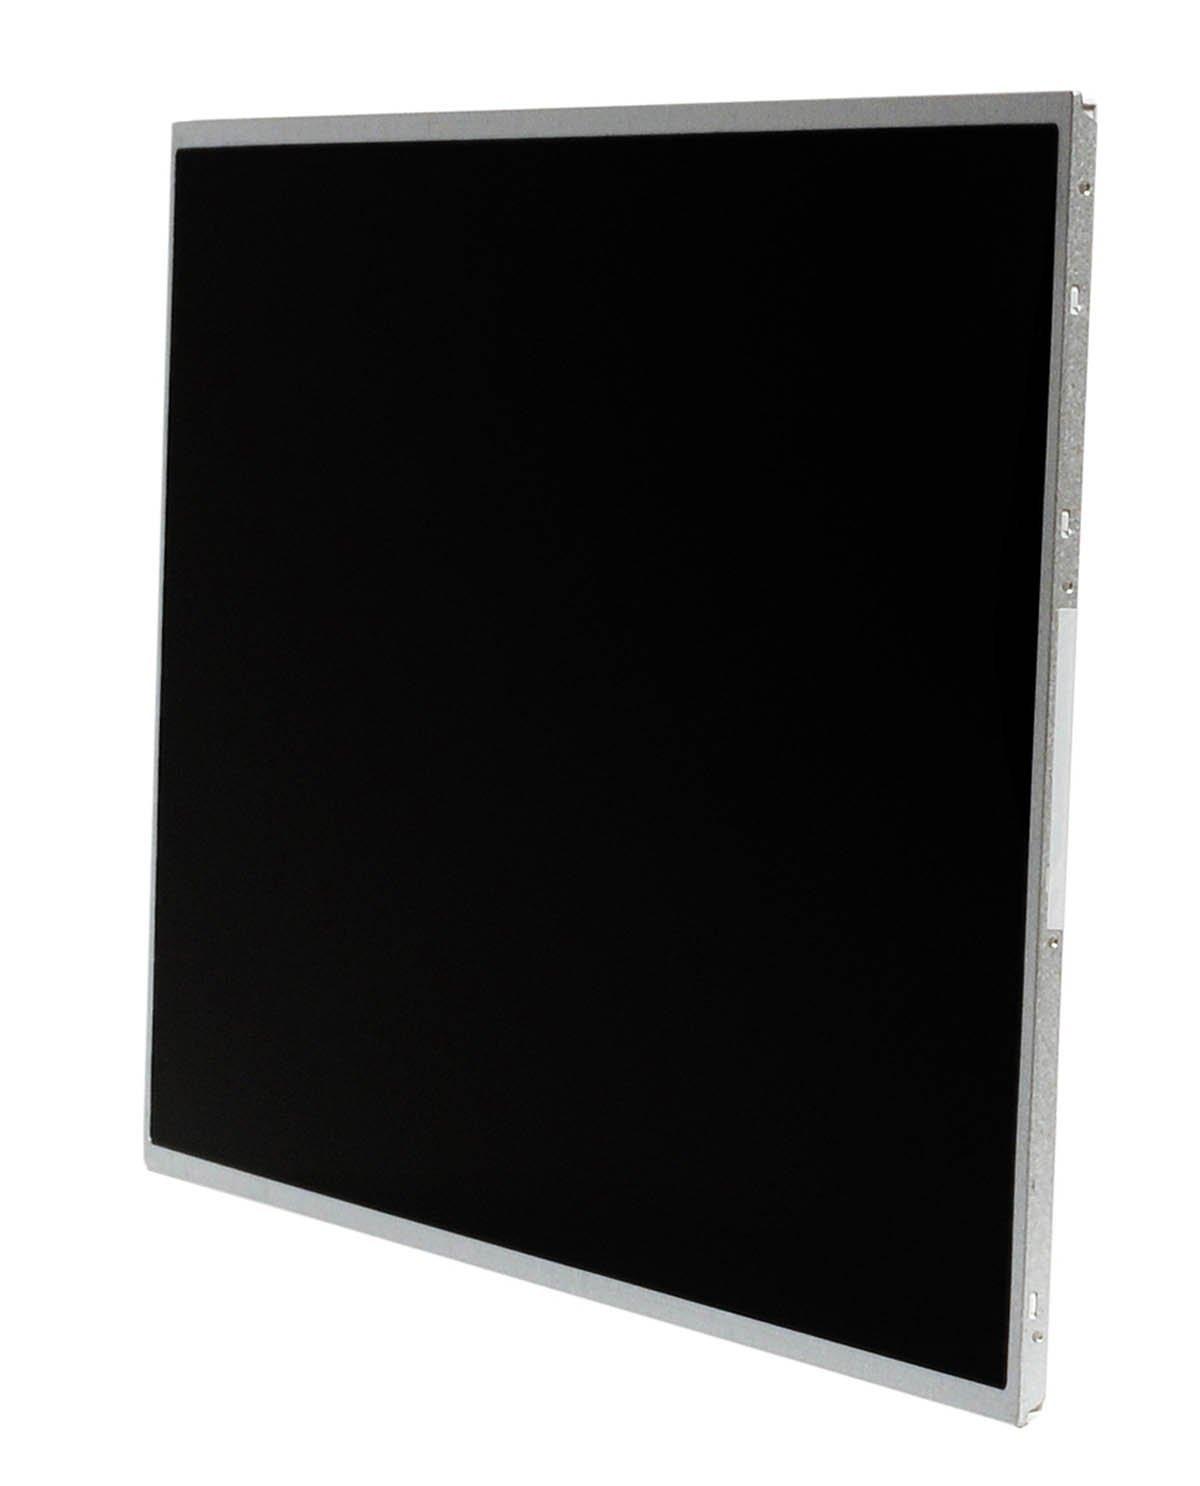 NEW DISPLAY FOR HP PROBOOK 4520S LAPTOP LCD LED SCREEN 15.6 WXGA